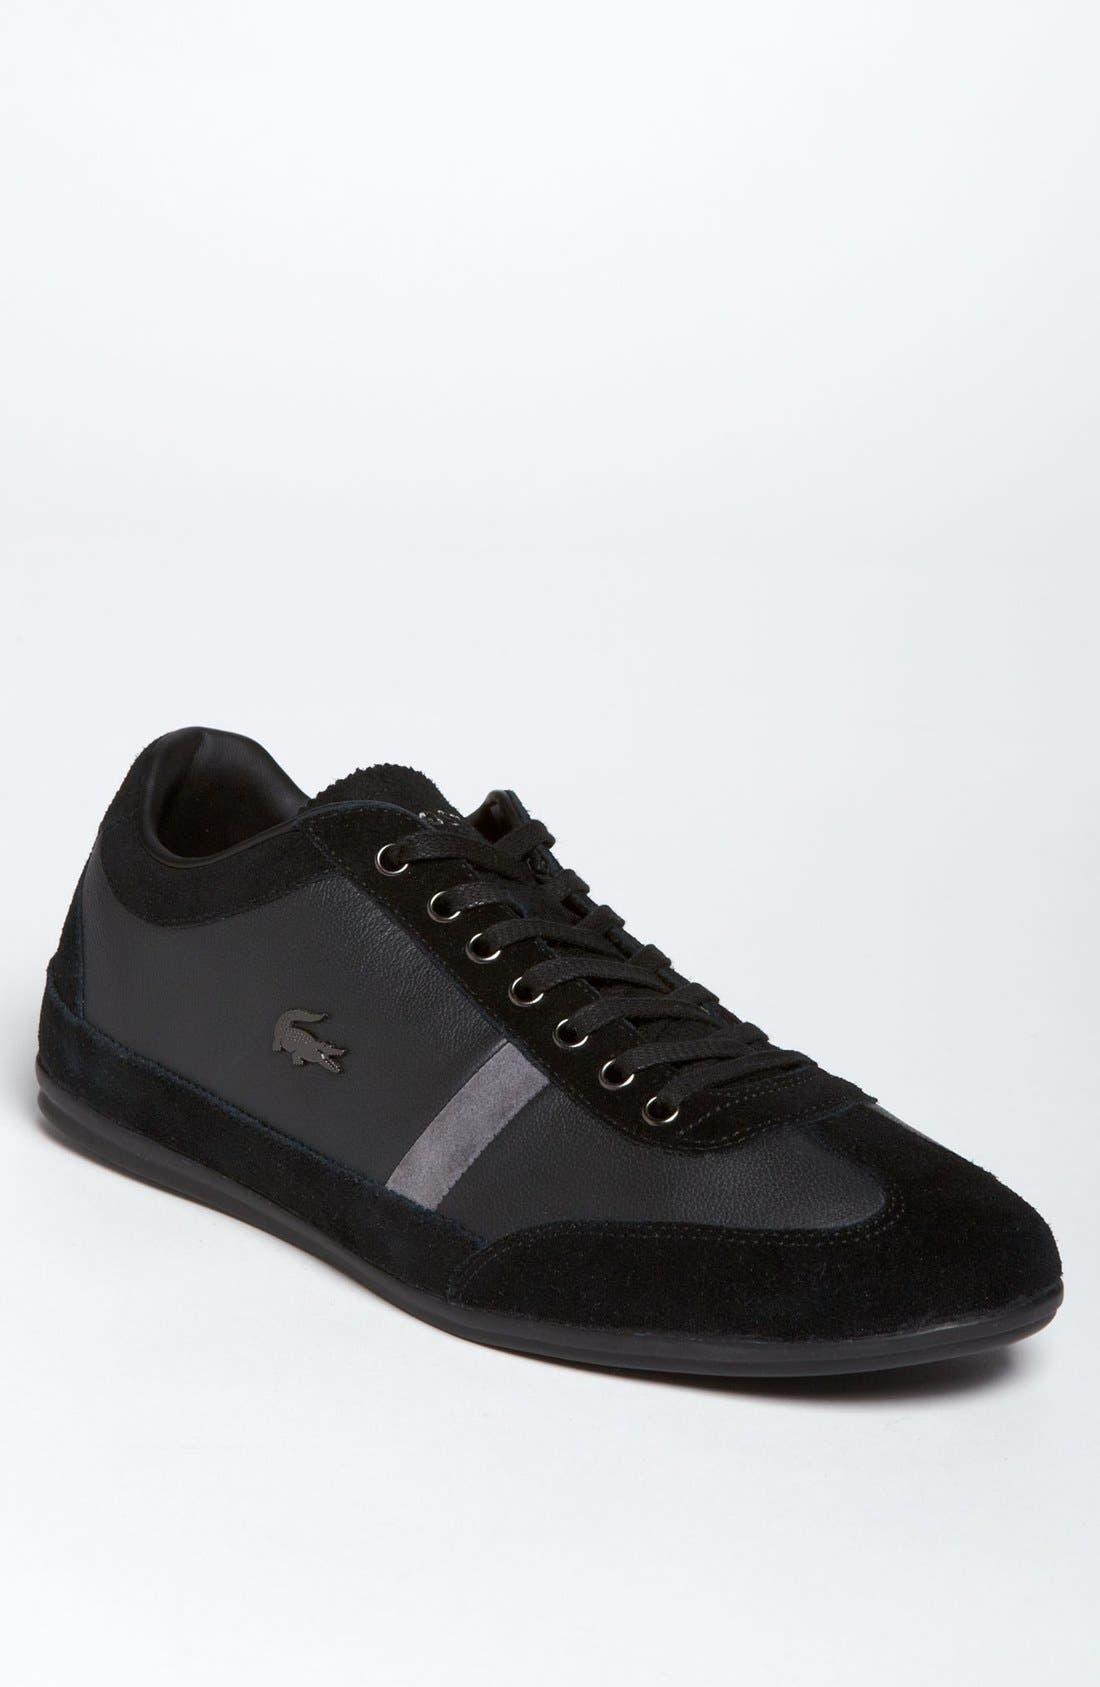 Main Image - Lacoste 'Misano 22' Sneaker